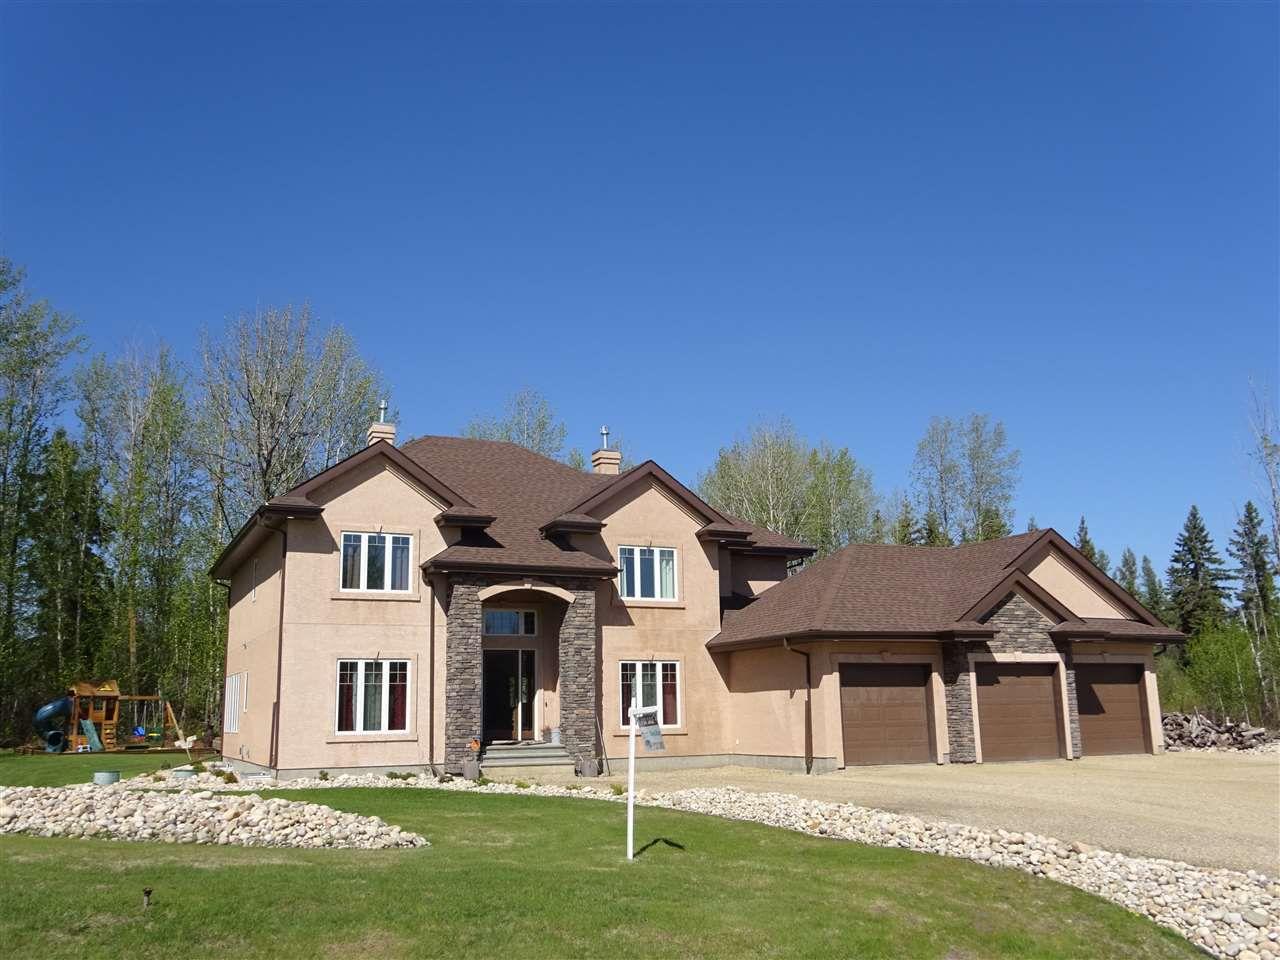 Main Photo: 10 53216 RR 264: Rural Parkland County House for sale : MLS®# E4152380